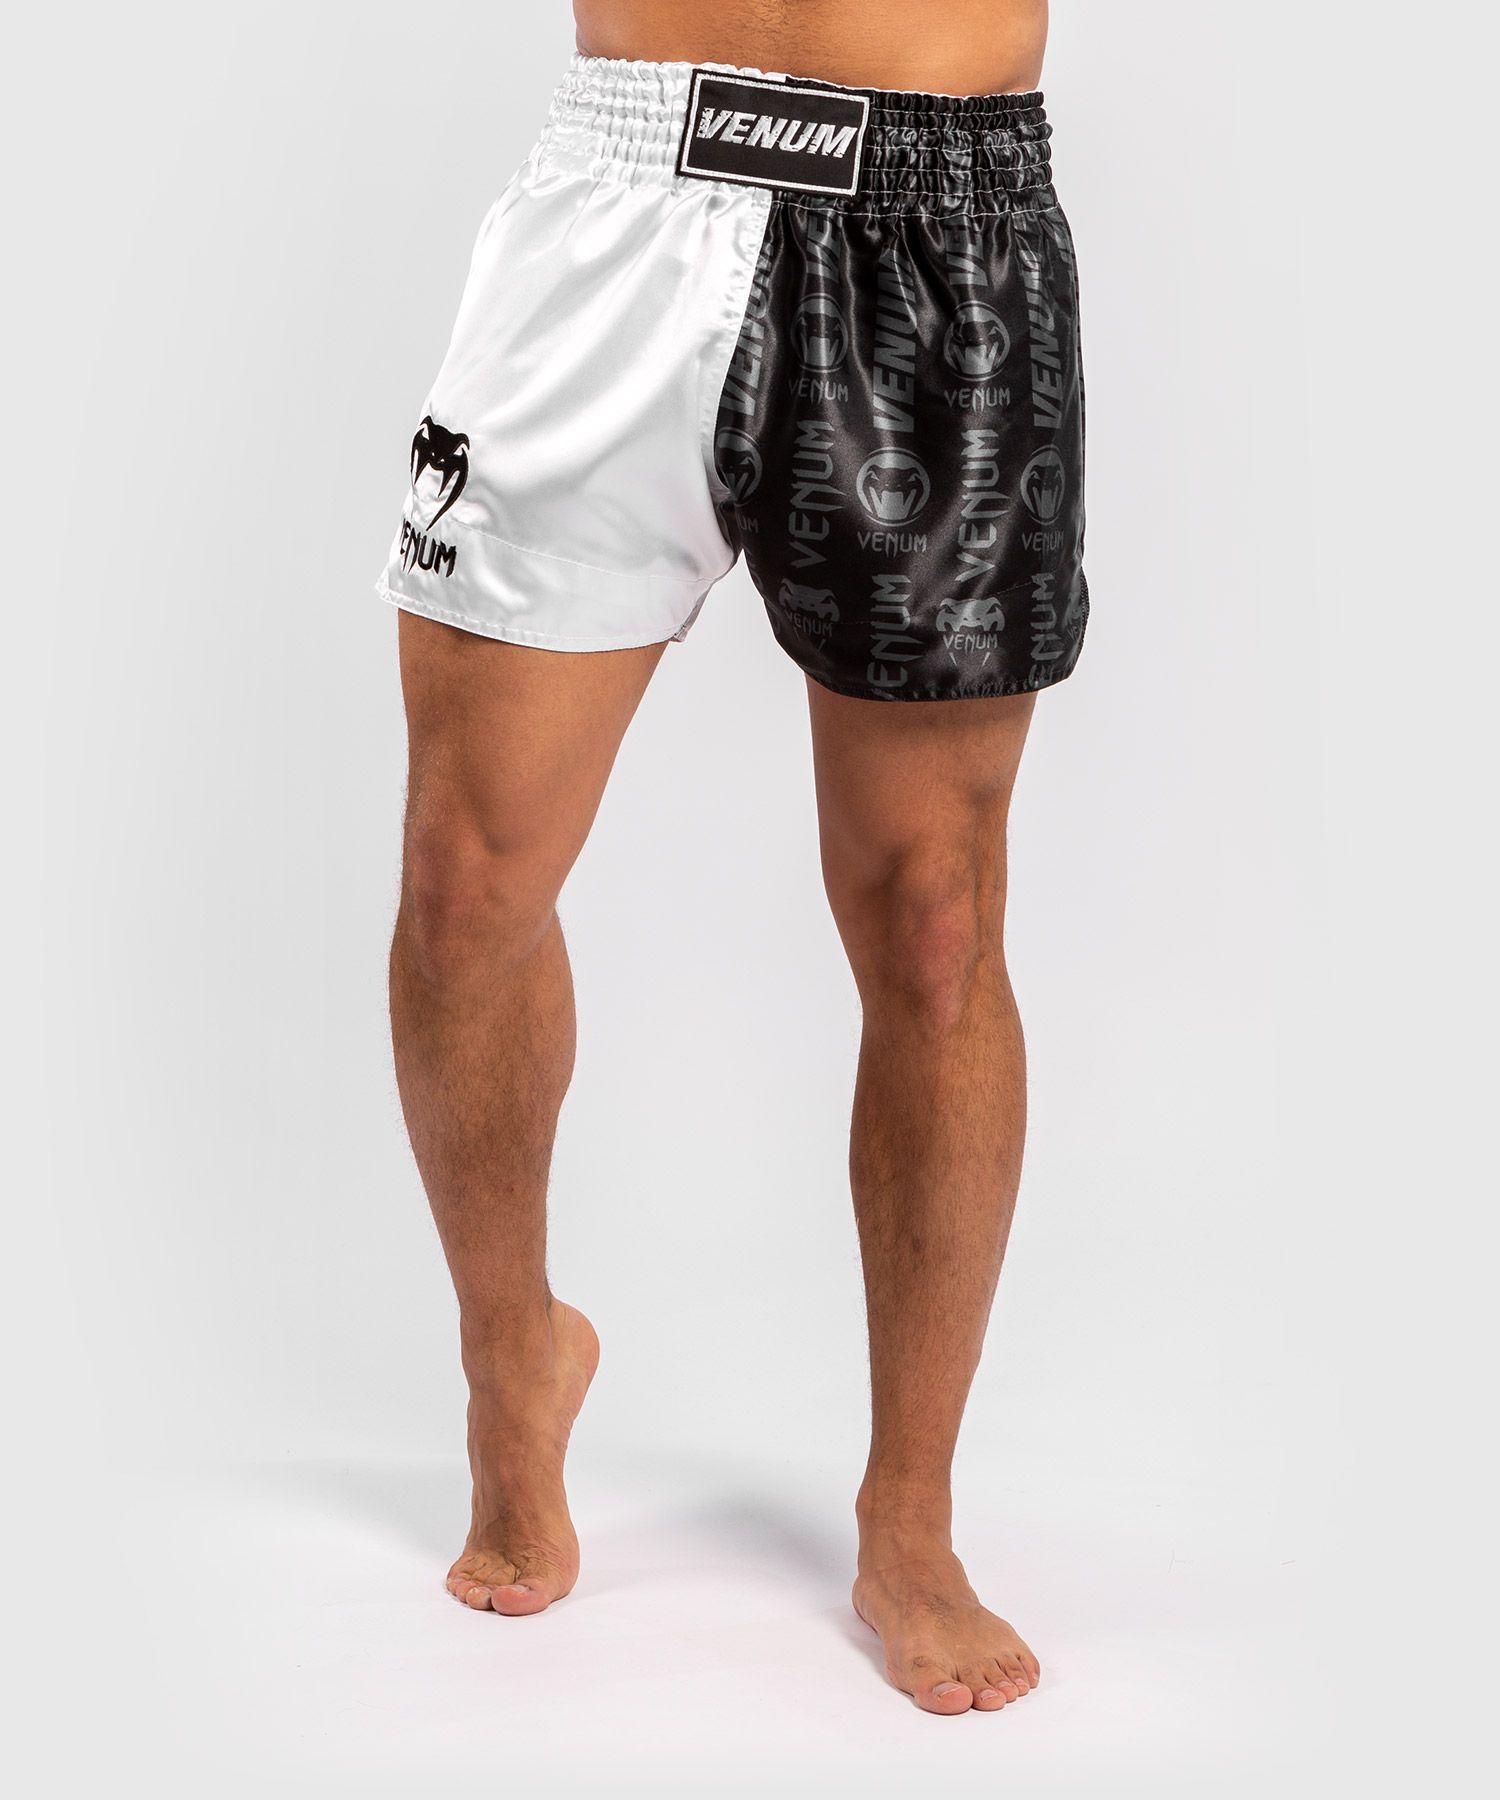 Venum Logos Muay Thai Shorts - Black/White